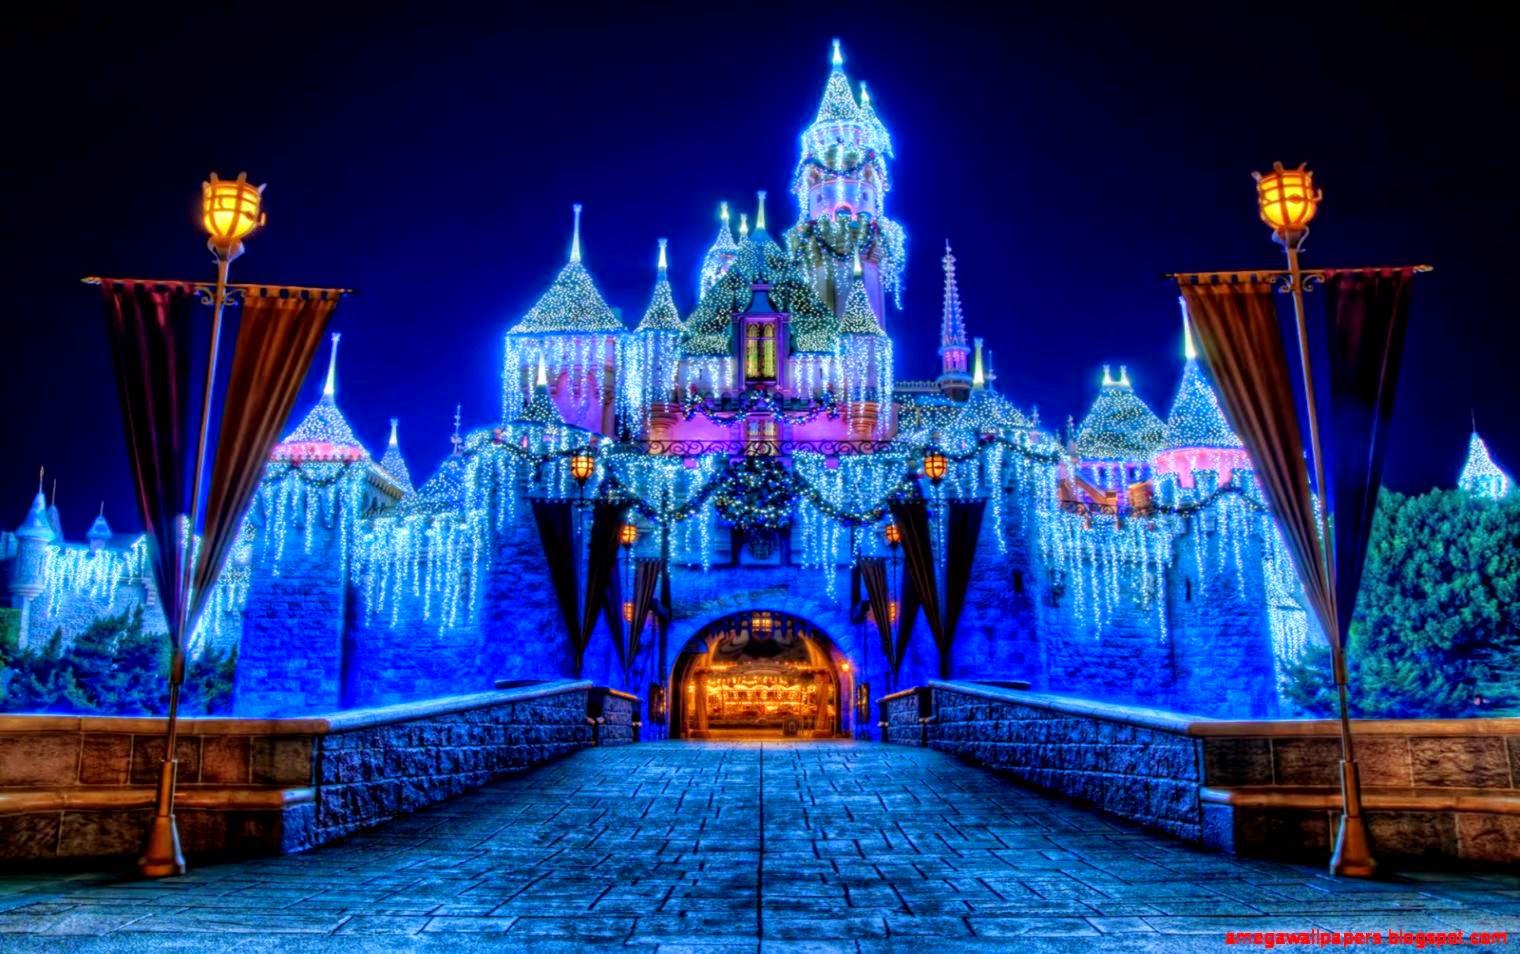 Disneyland Hd Wallpaper Mega Wallpapers 1520x954